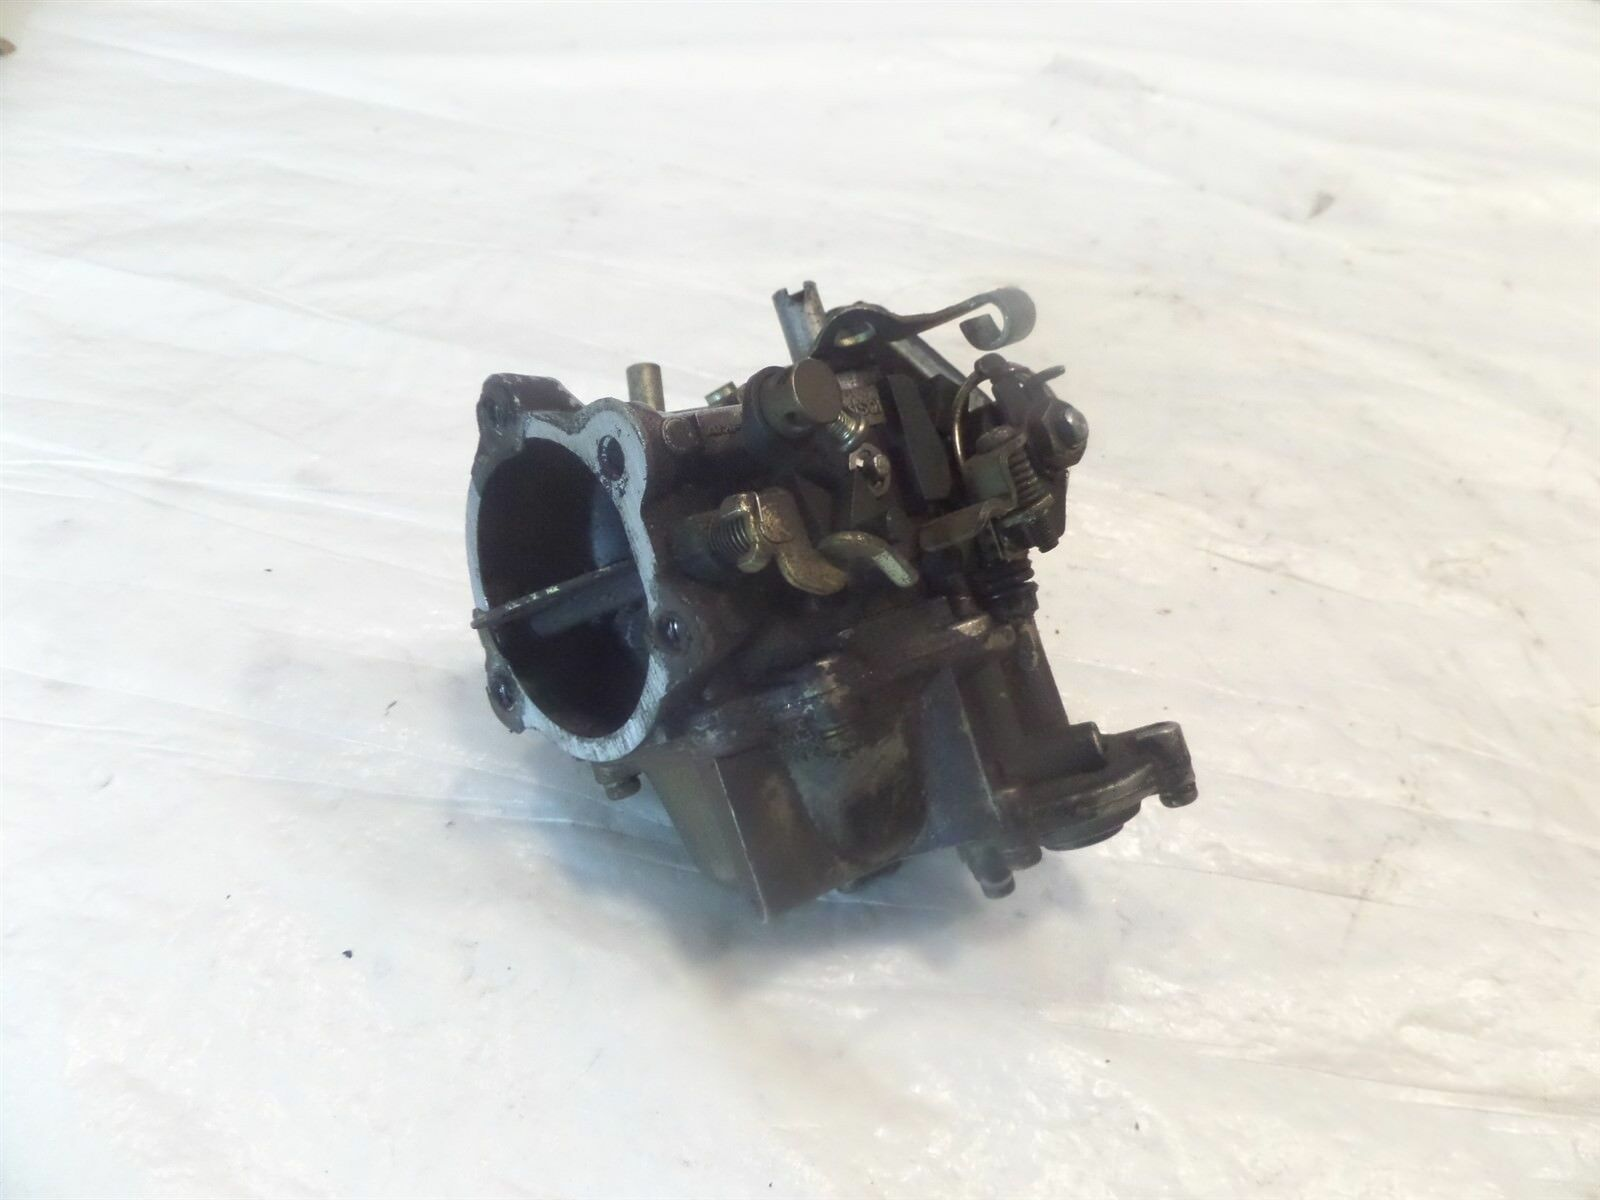 Sportster Ironhead AMF Carburetor for Early 1982 27469-81a Keihin